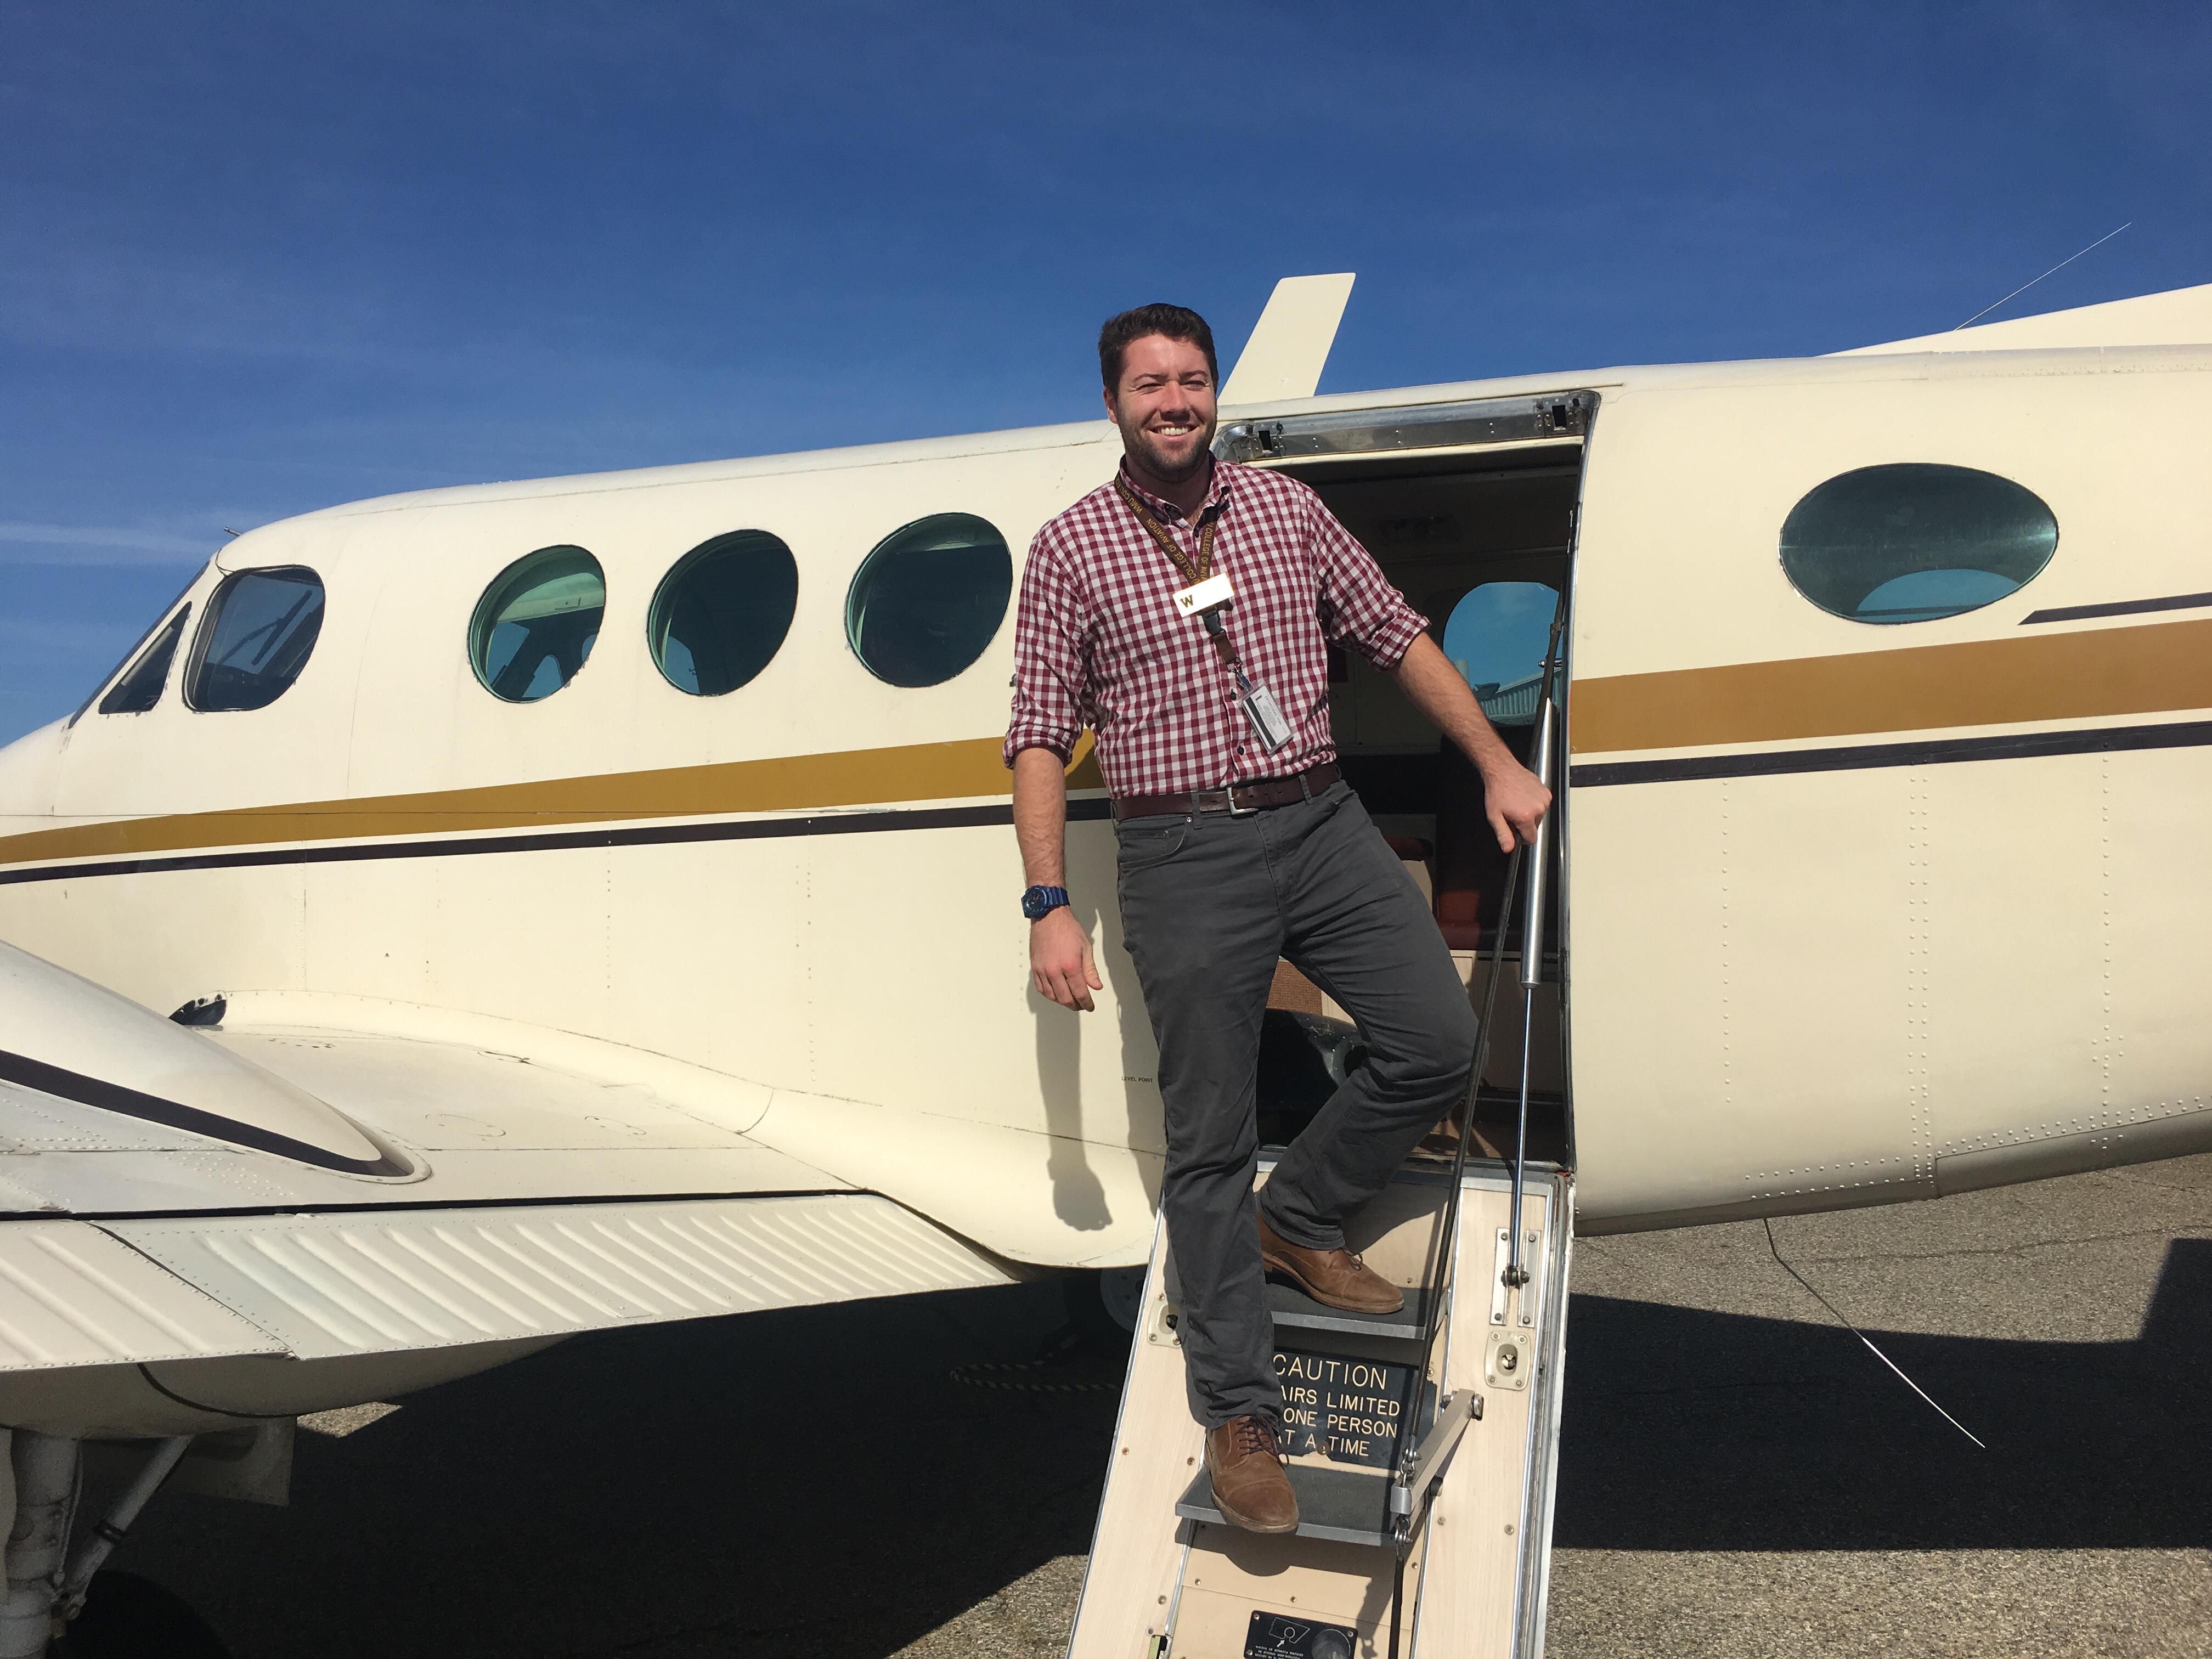 Tom Souder WMU Aviation Technical Operations Alumni